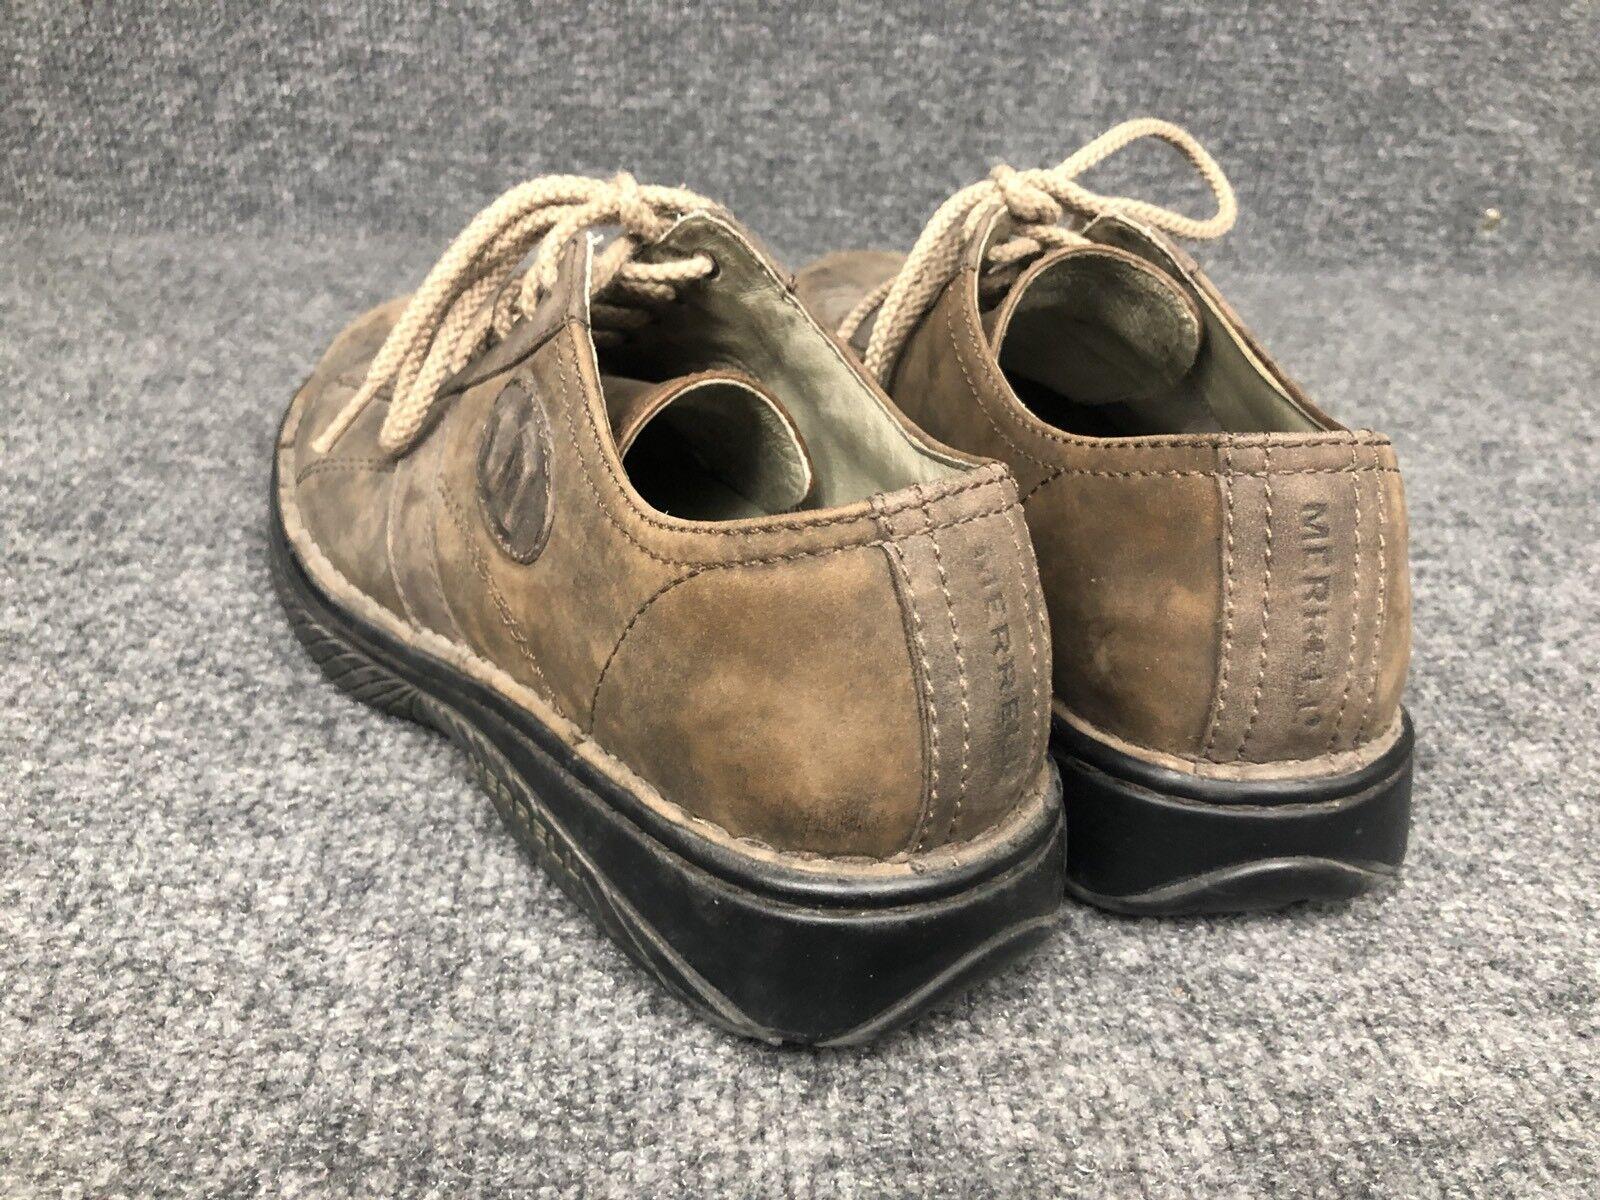 Merrell  Uomo Sz 8 Dappled Chocolate Braun In Leder Casual Oxfords Schuhes In Braun EUC 69b6b4